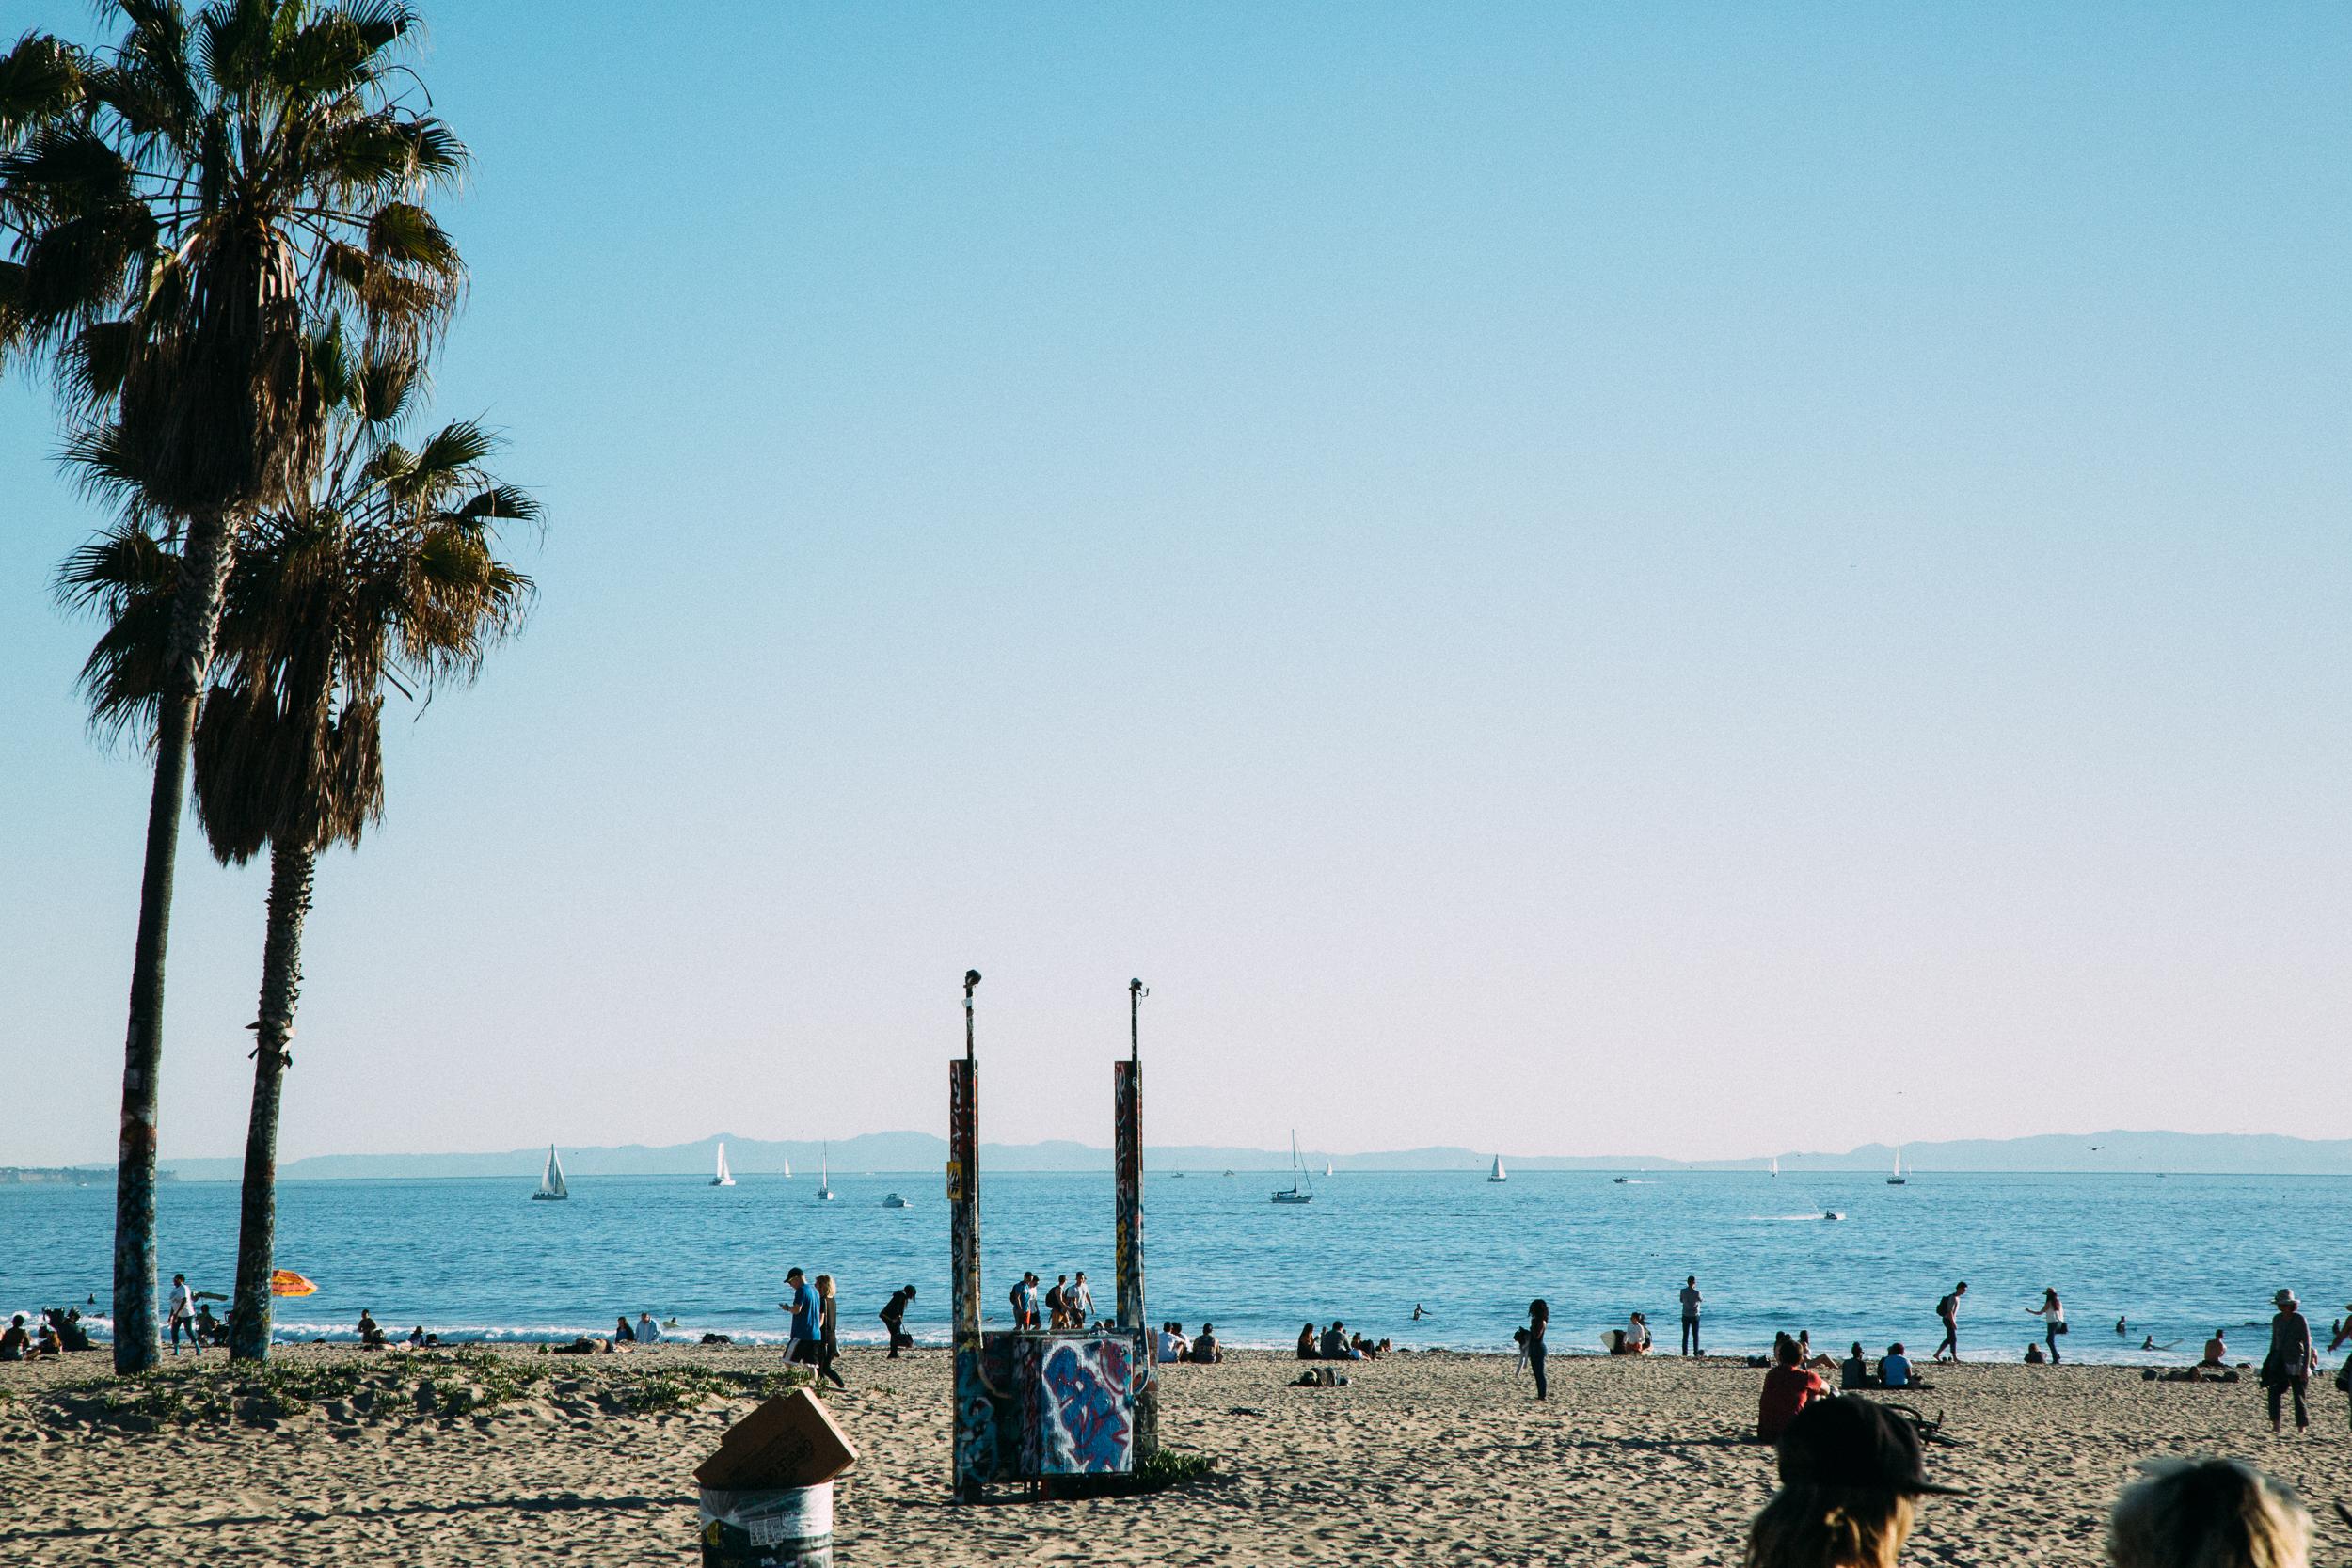 Los_Angeles_Travel_Photography_Laura_Suprenant-5.jpg